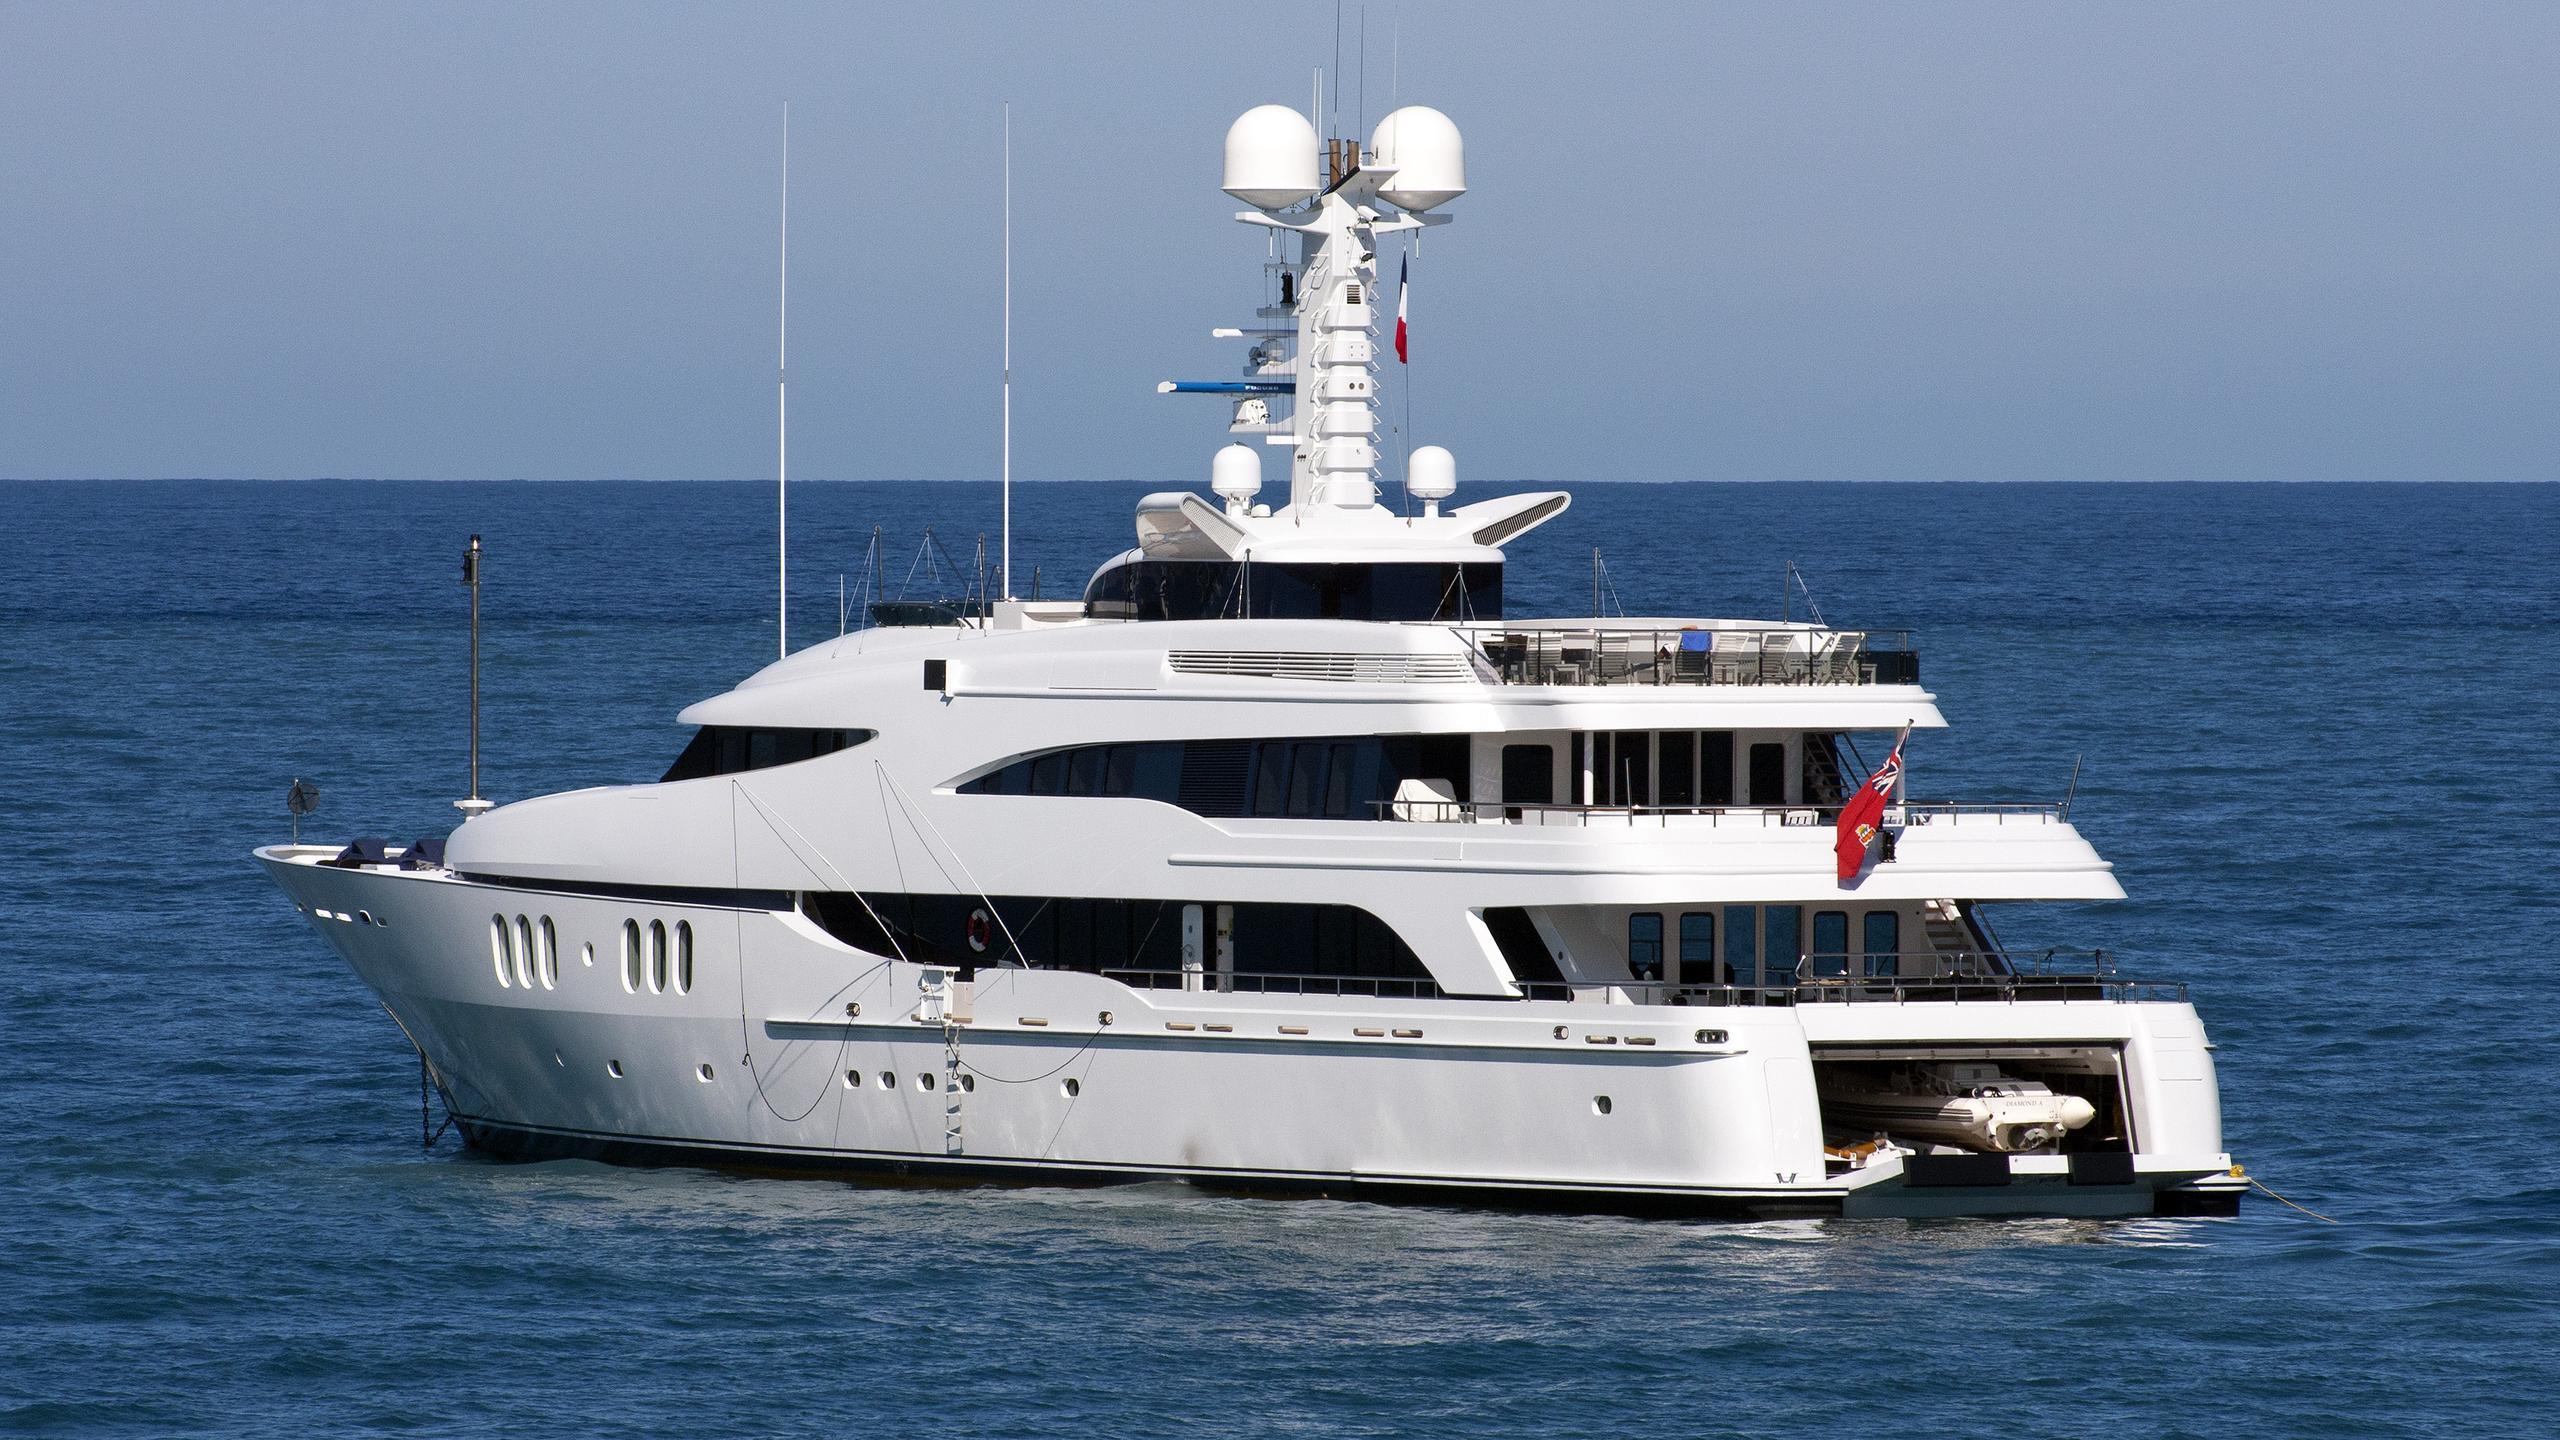 diamond-a-motor-yacht-abeking-rasmussen-1998-57m-half-profile